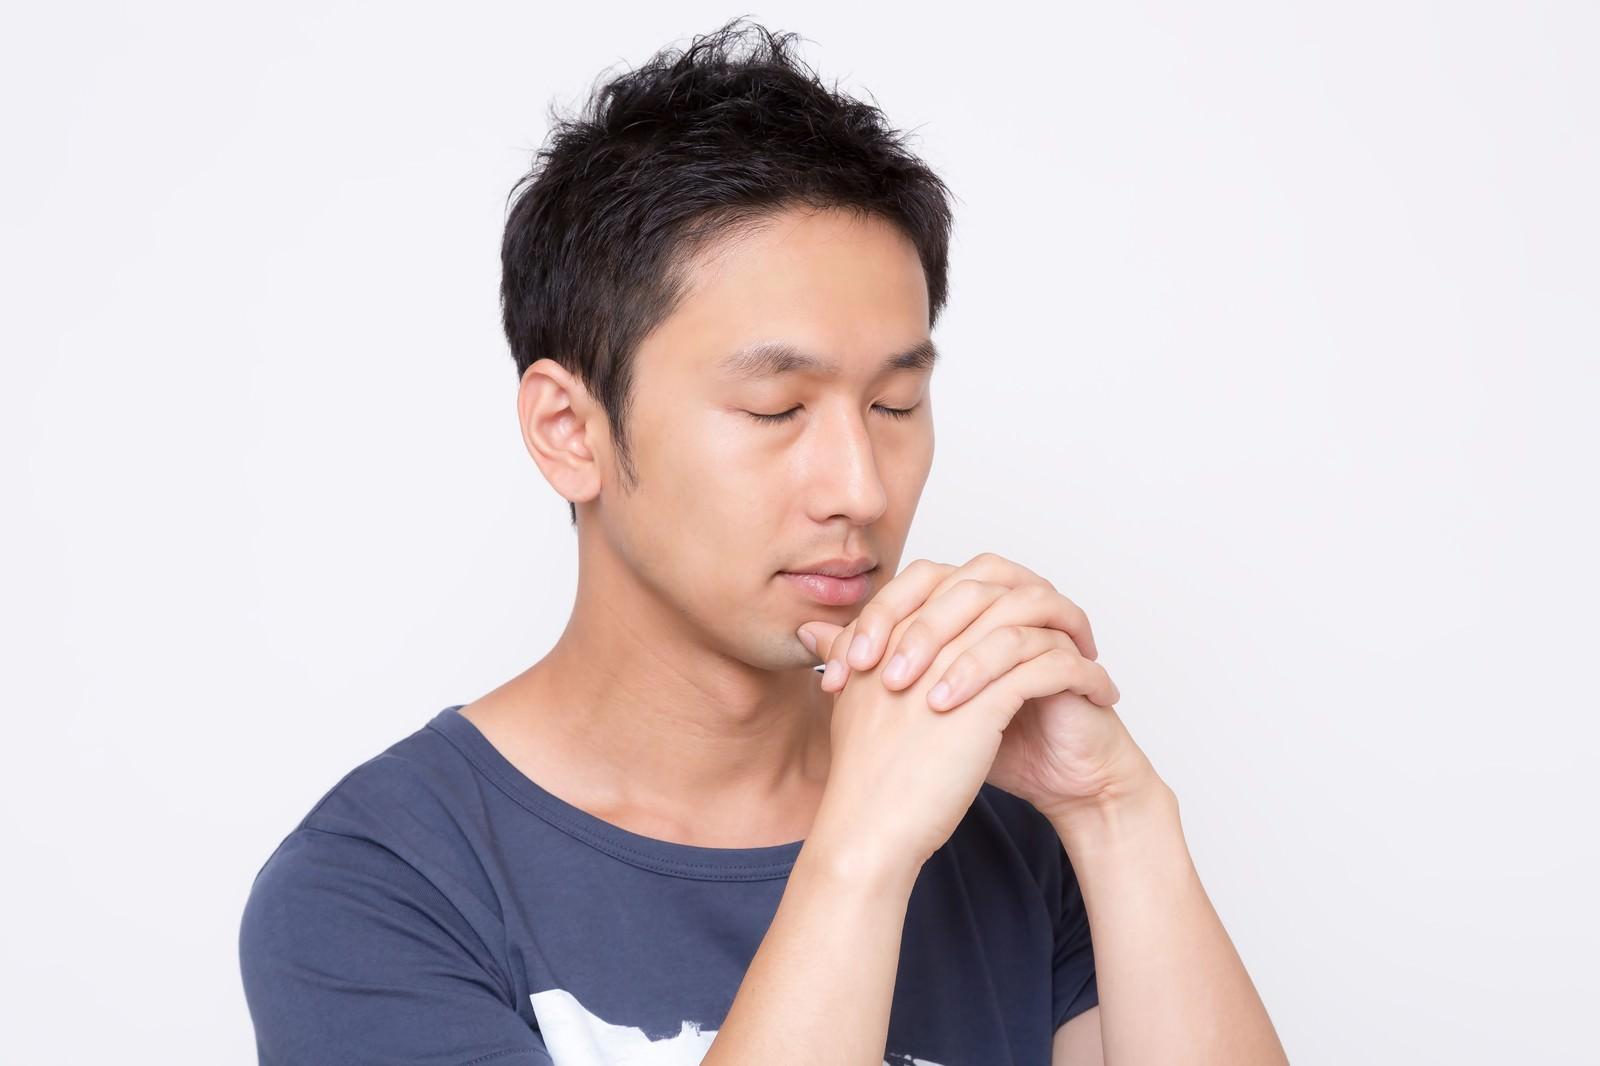 https://www.pakutaso.com/shared/img/thumb/OOK88_inoruookawasan_TP_V.jpg